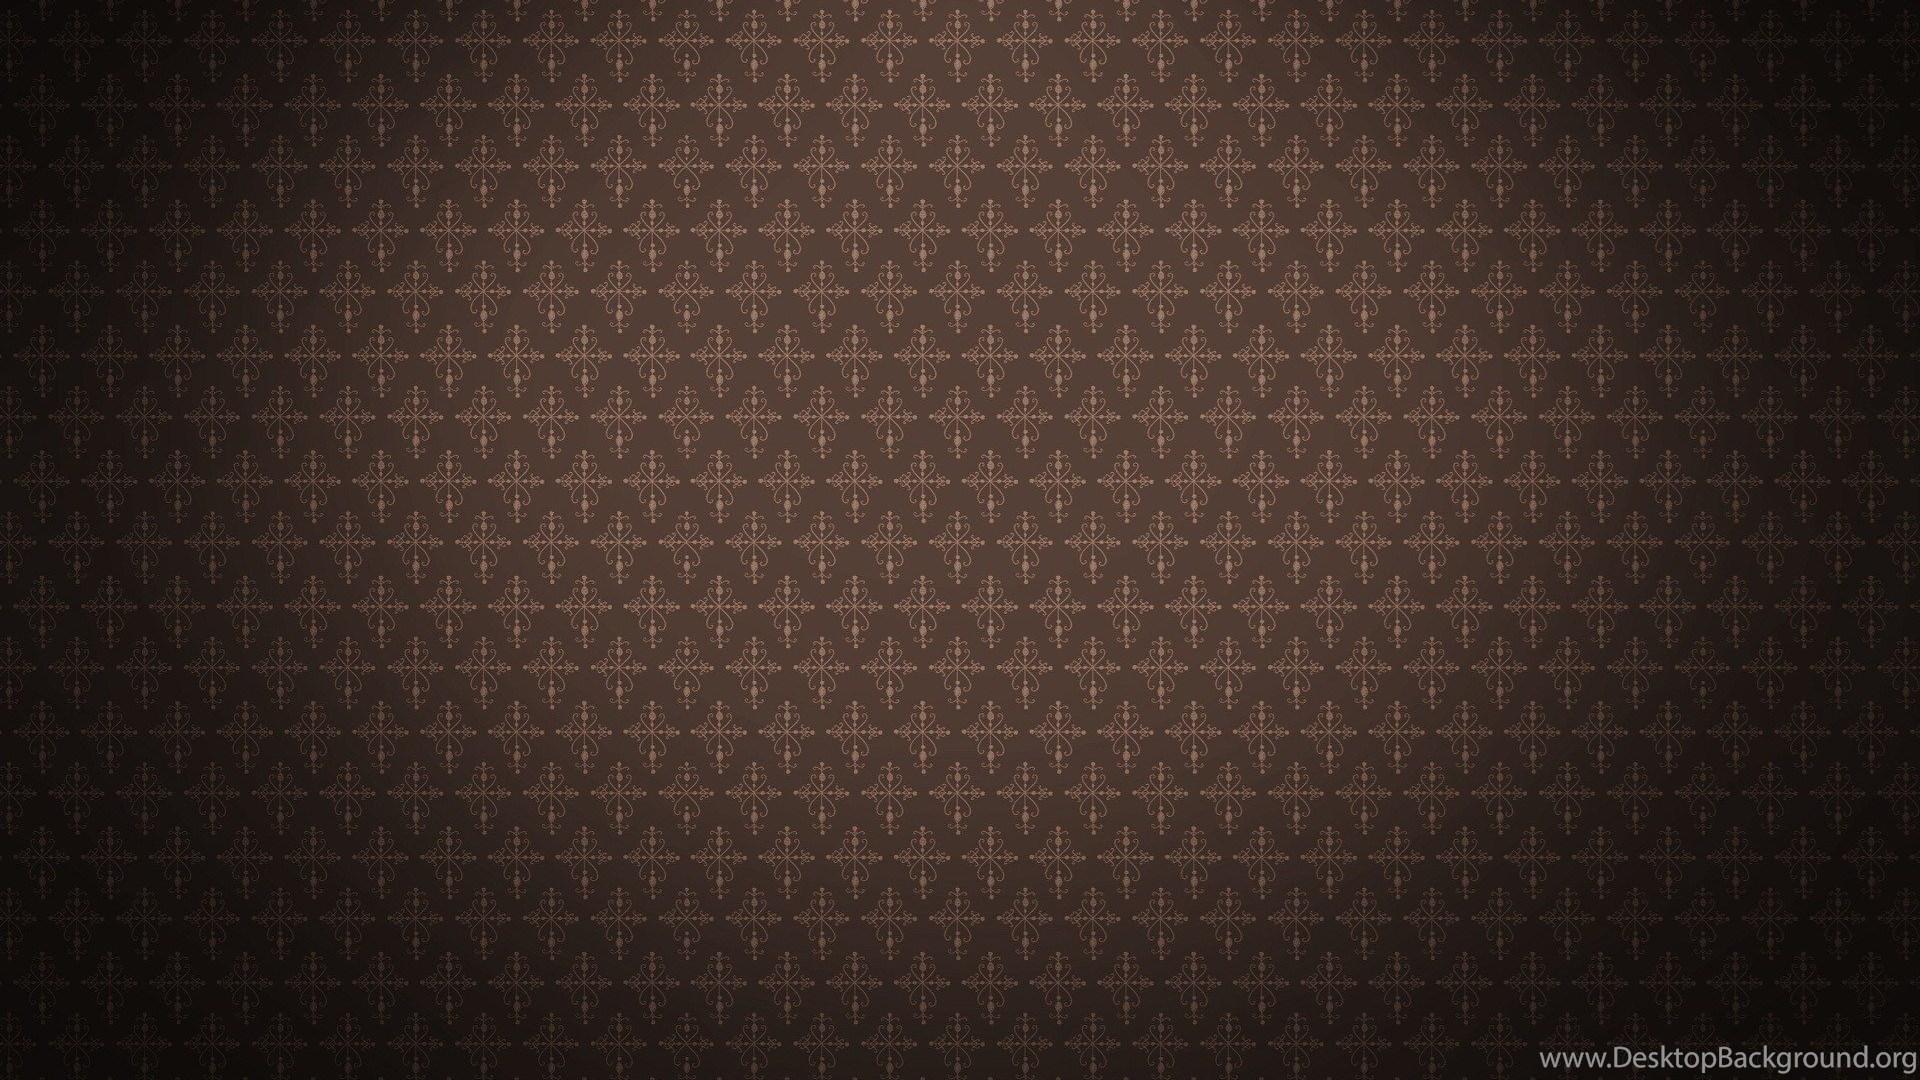 Louis Vuitton Wallpapers Hd Desktop Background